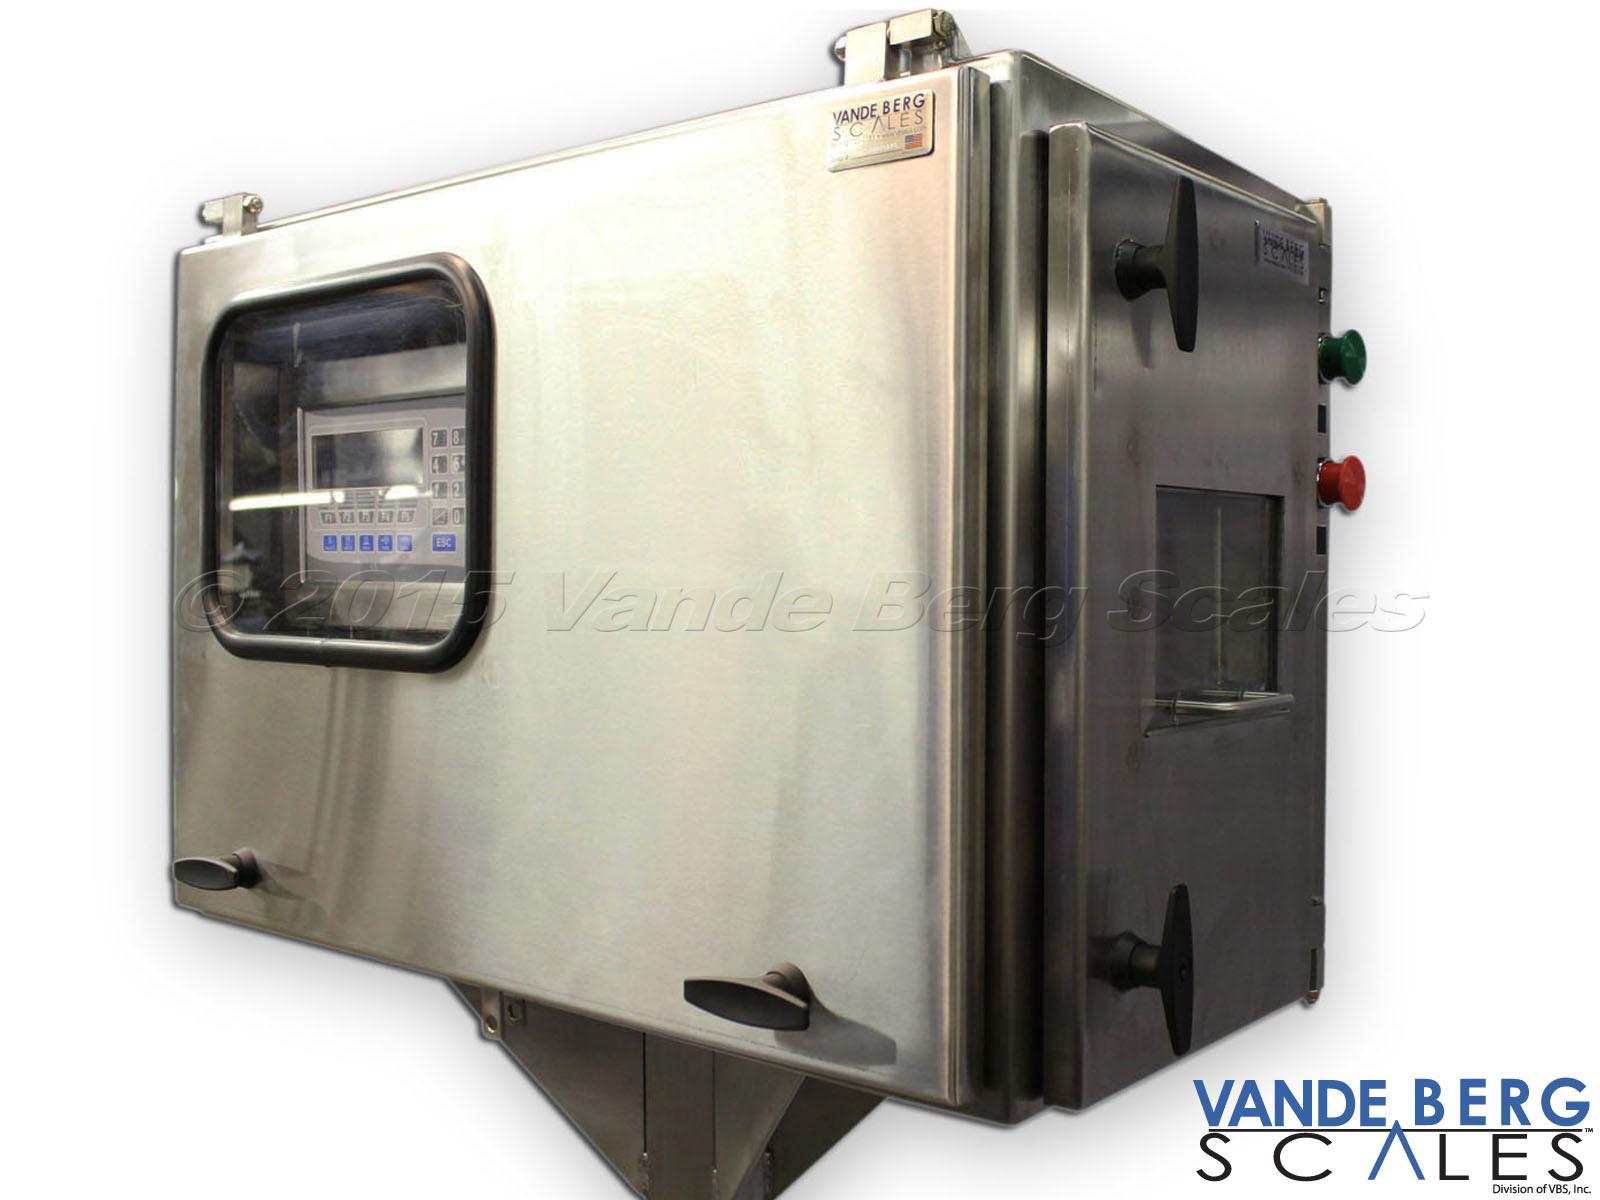 Stainless Steel Printers : Printer enclosures stainless steel washdown nema x